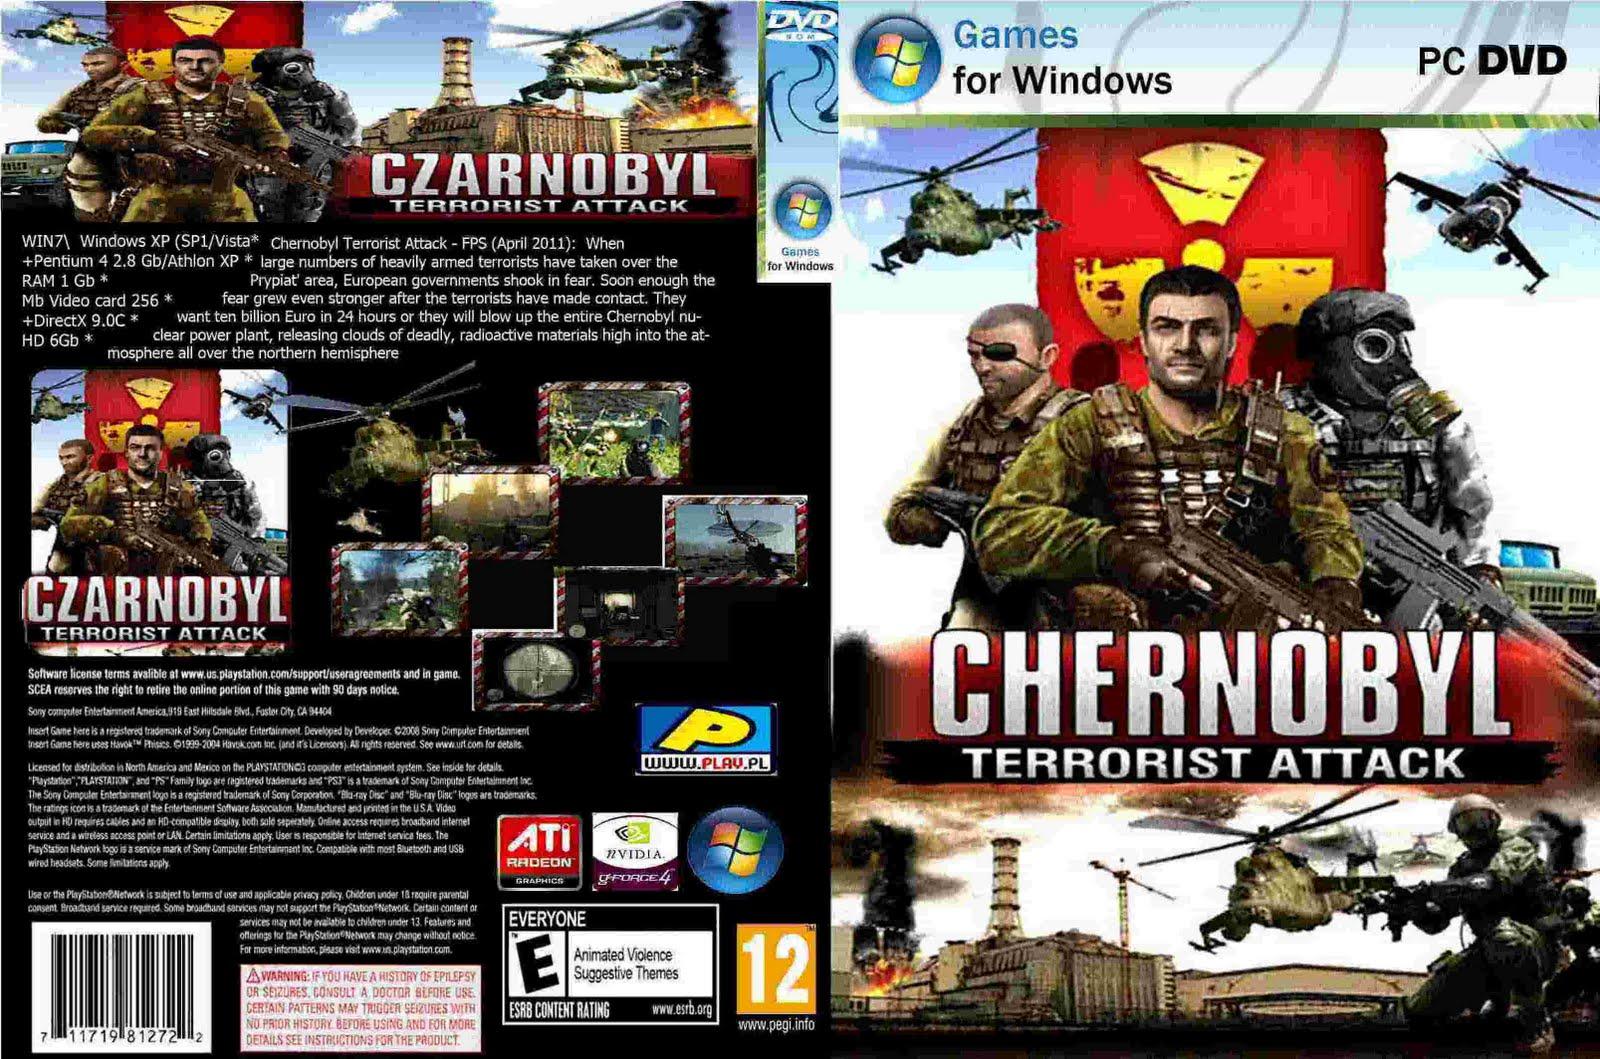 BELI ONLINE GAME KOMPUTER/PC